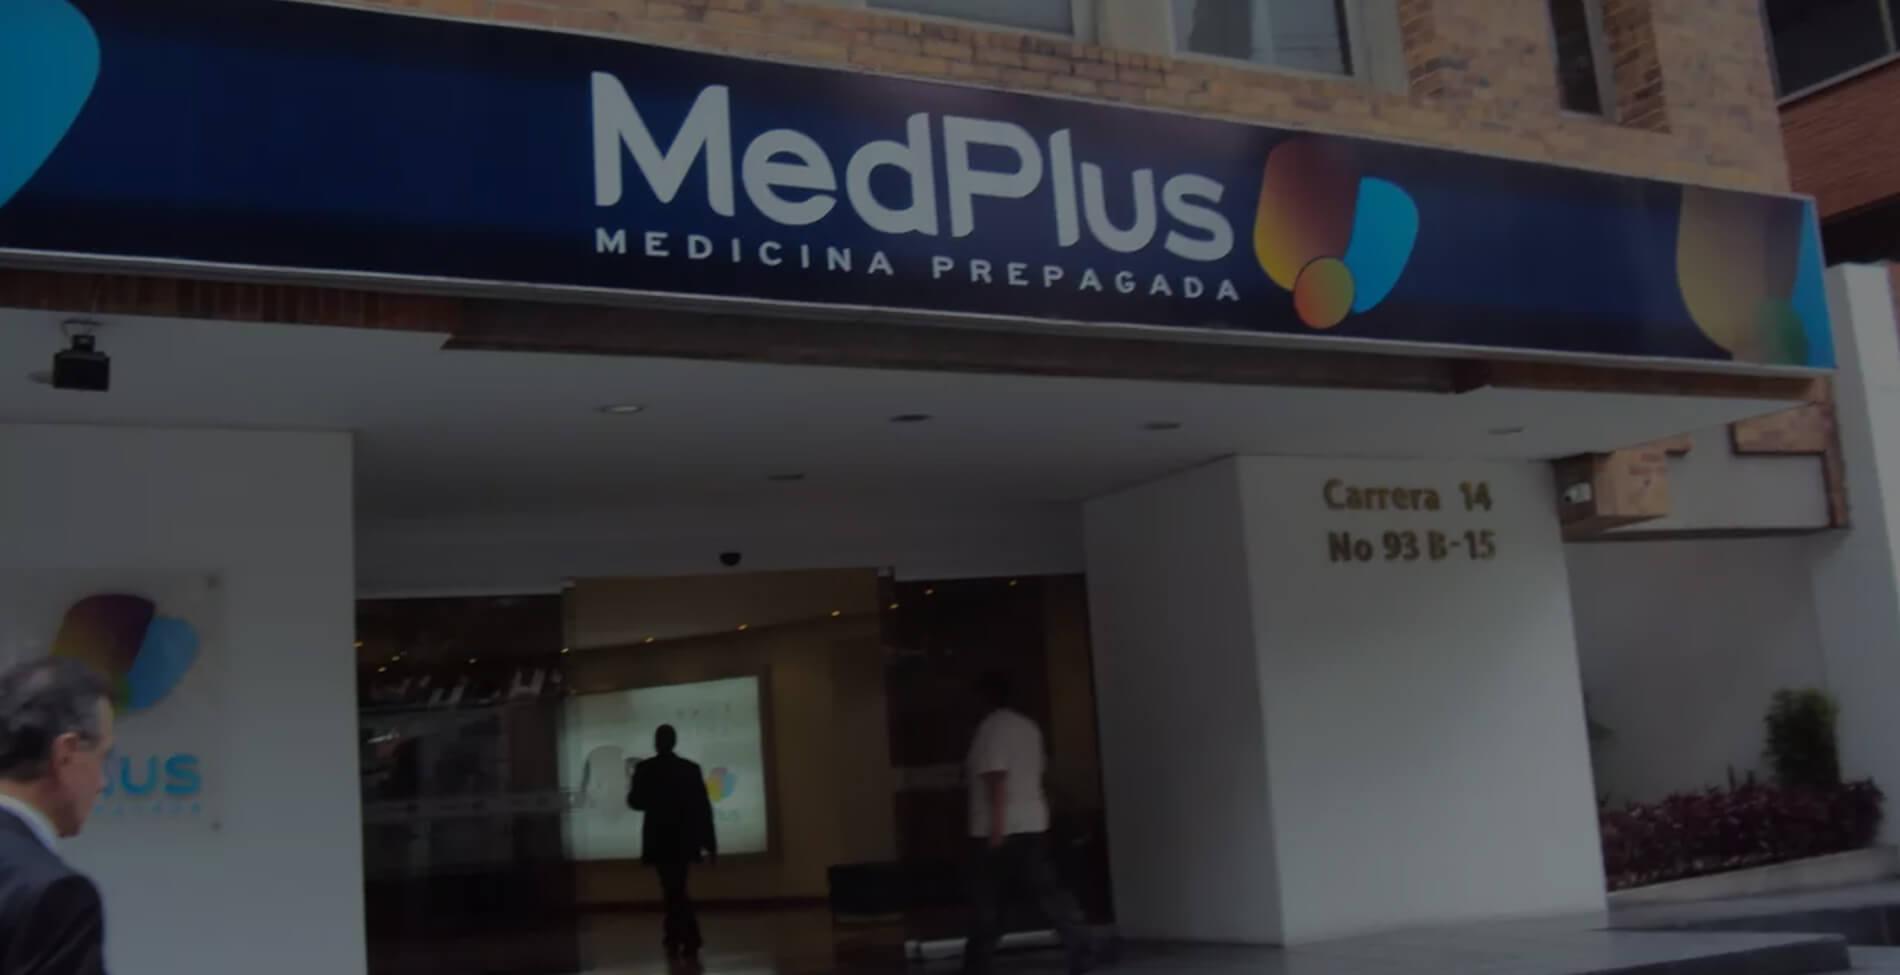 Imagen General Medicina Prepagada medplus